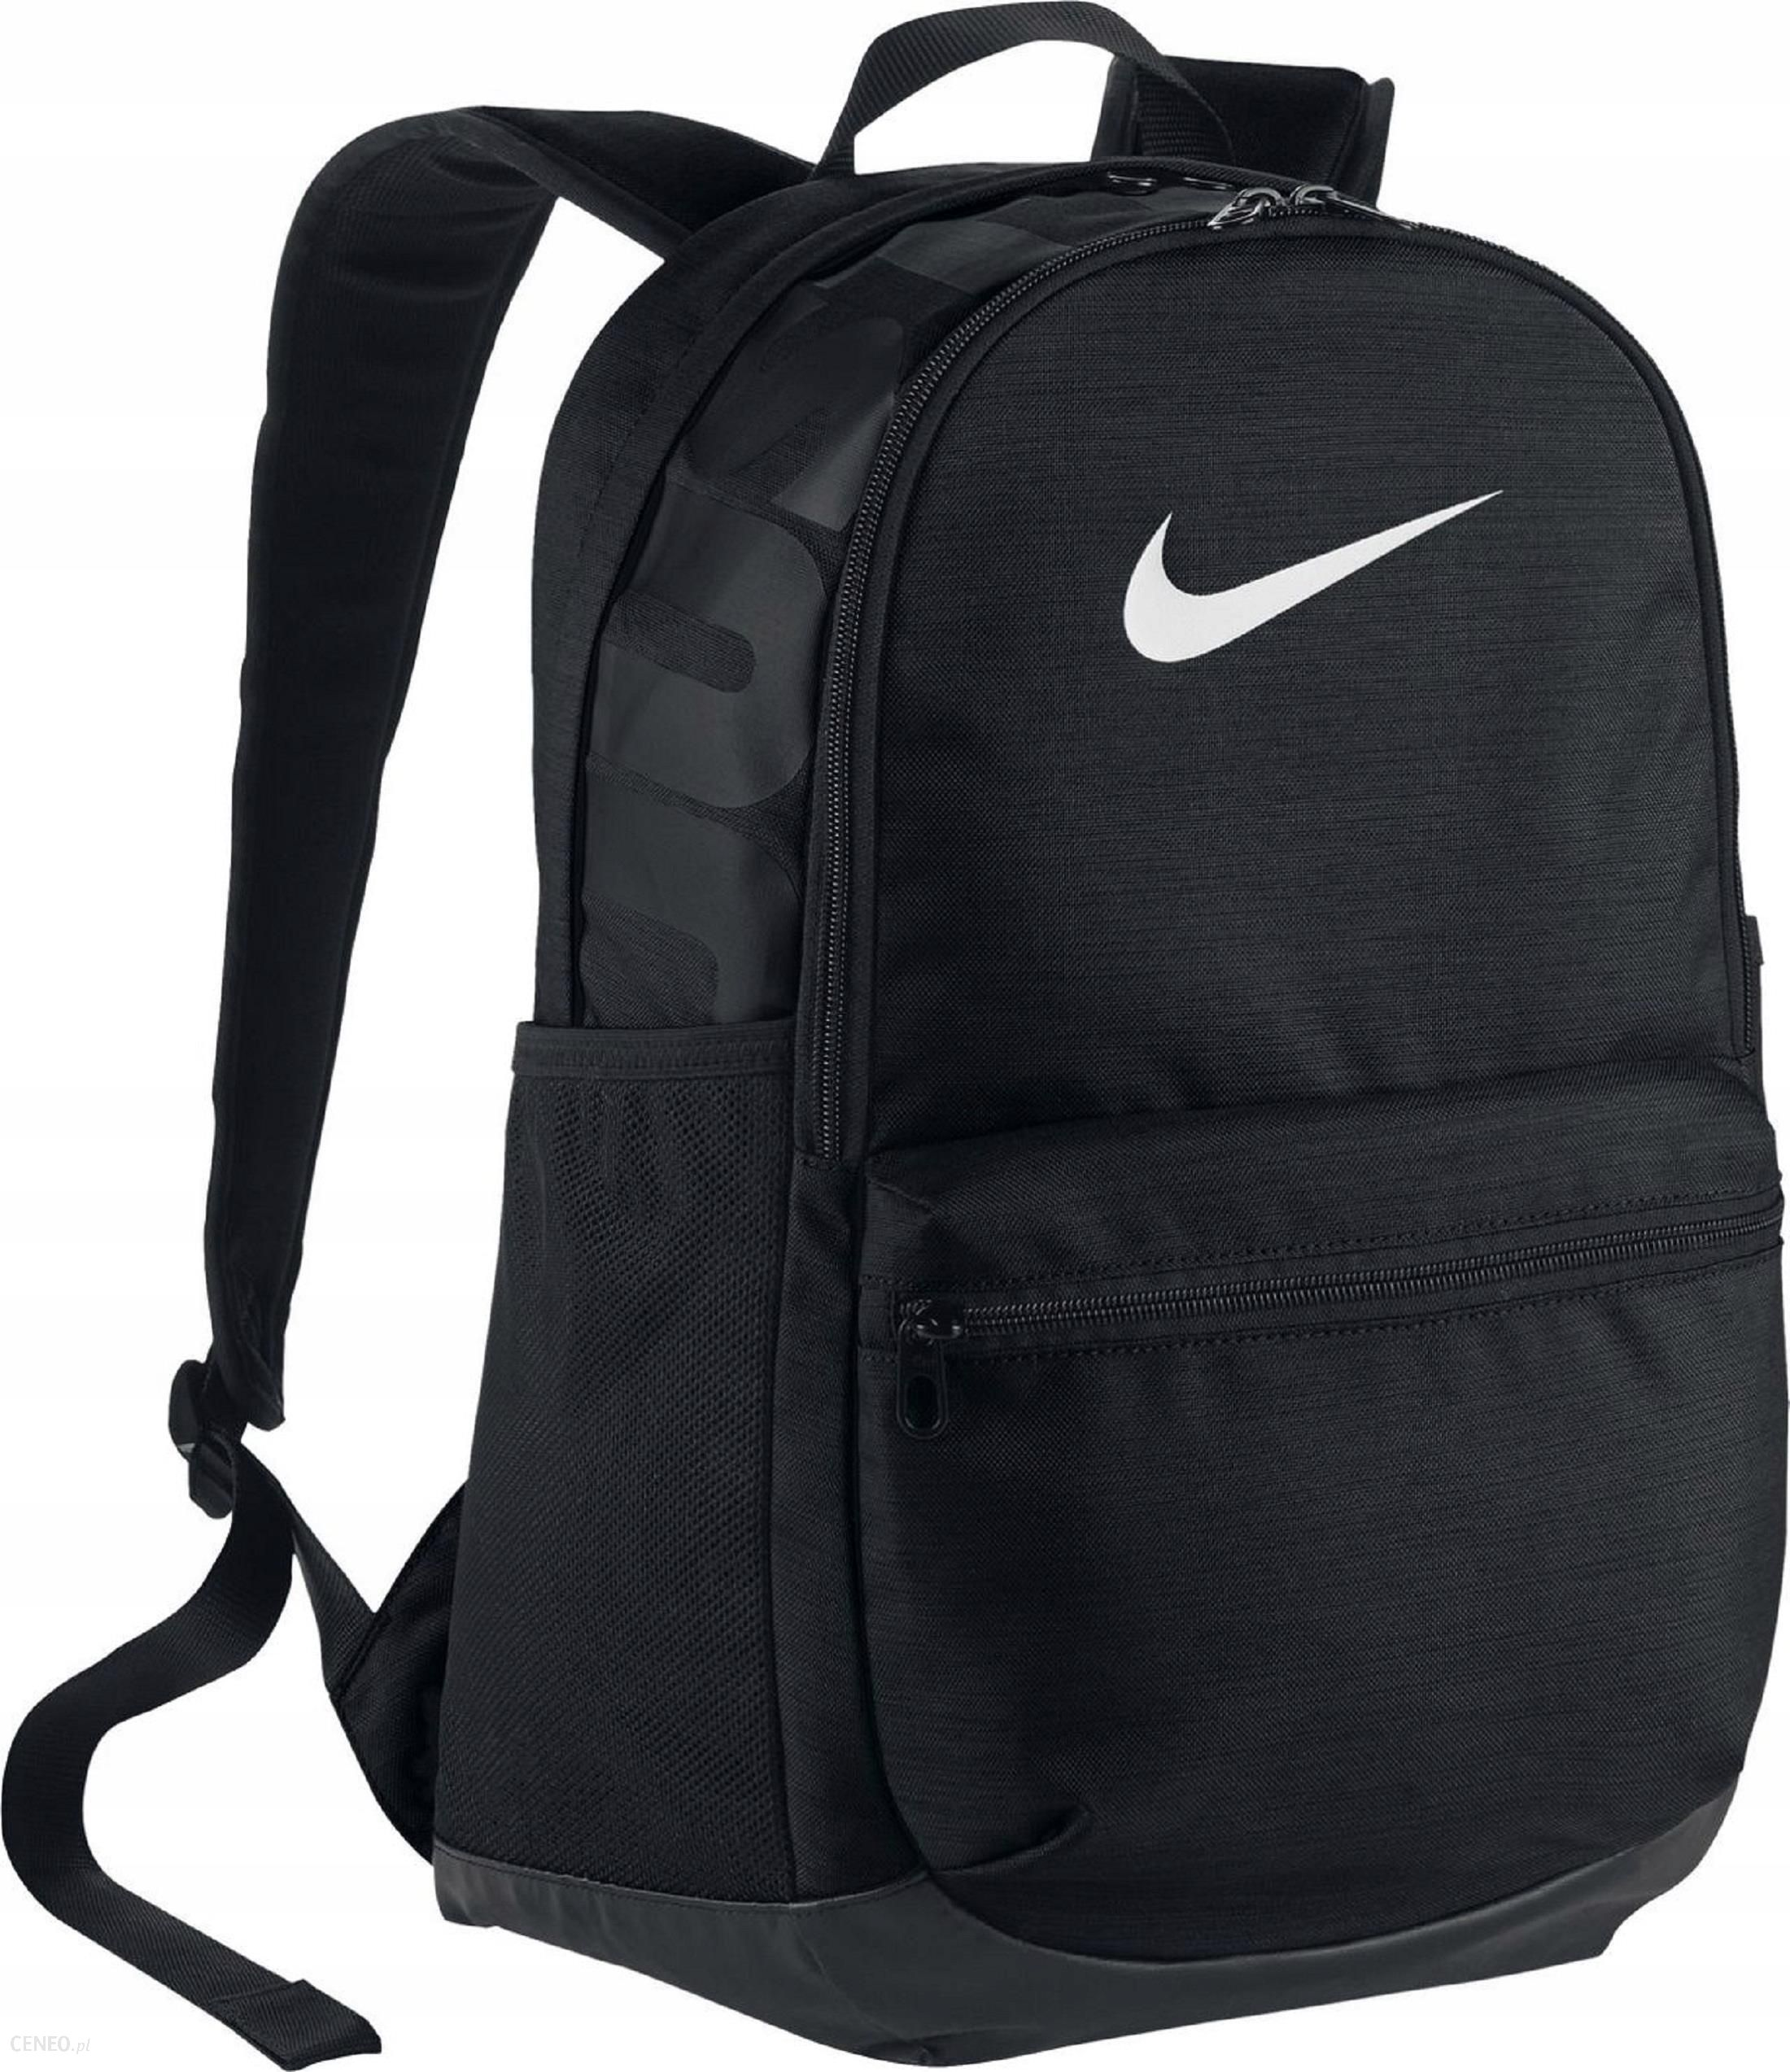 297e770ac6854 Plecak Nike Brasilia Training Ba5329 010 - Ceny i opinie - Ceneo.pl